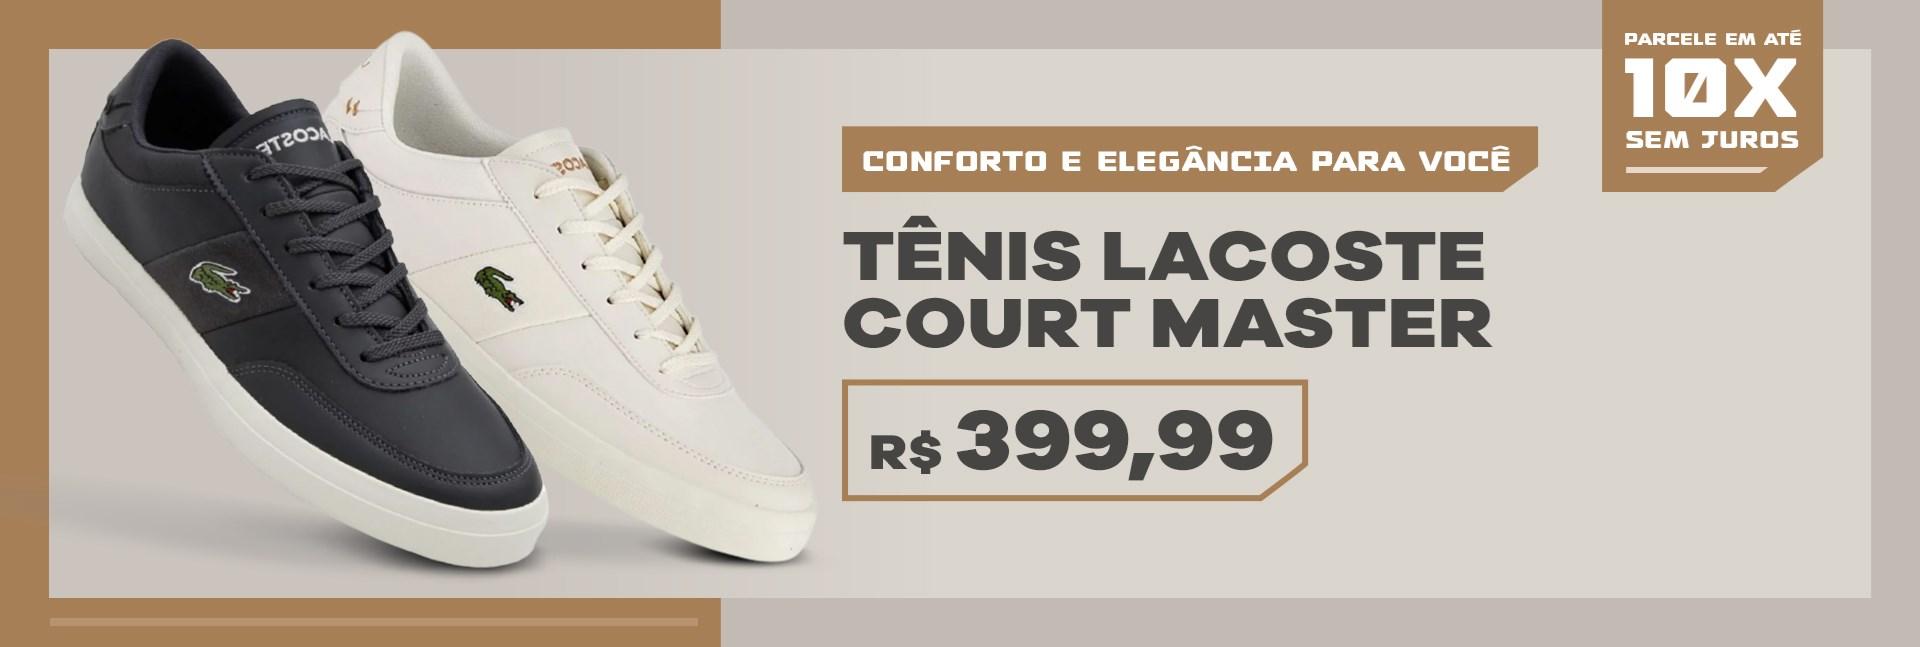 Tenis Lacoste Court Master